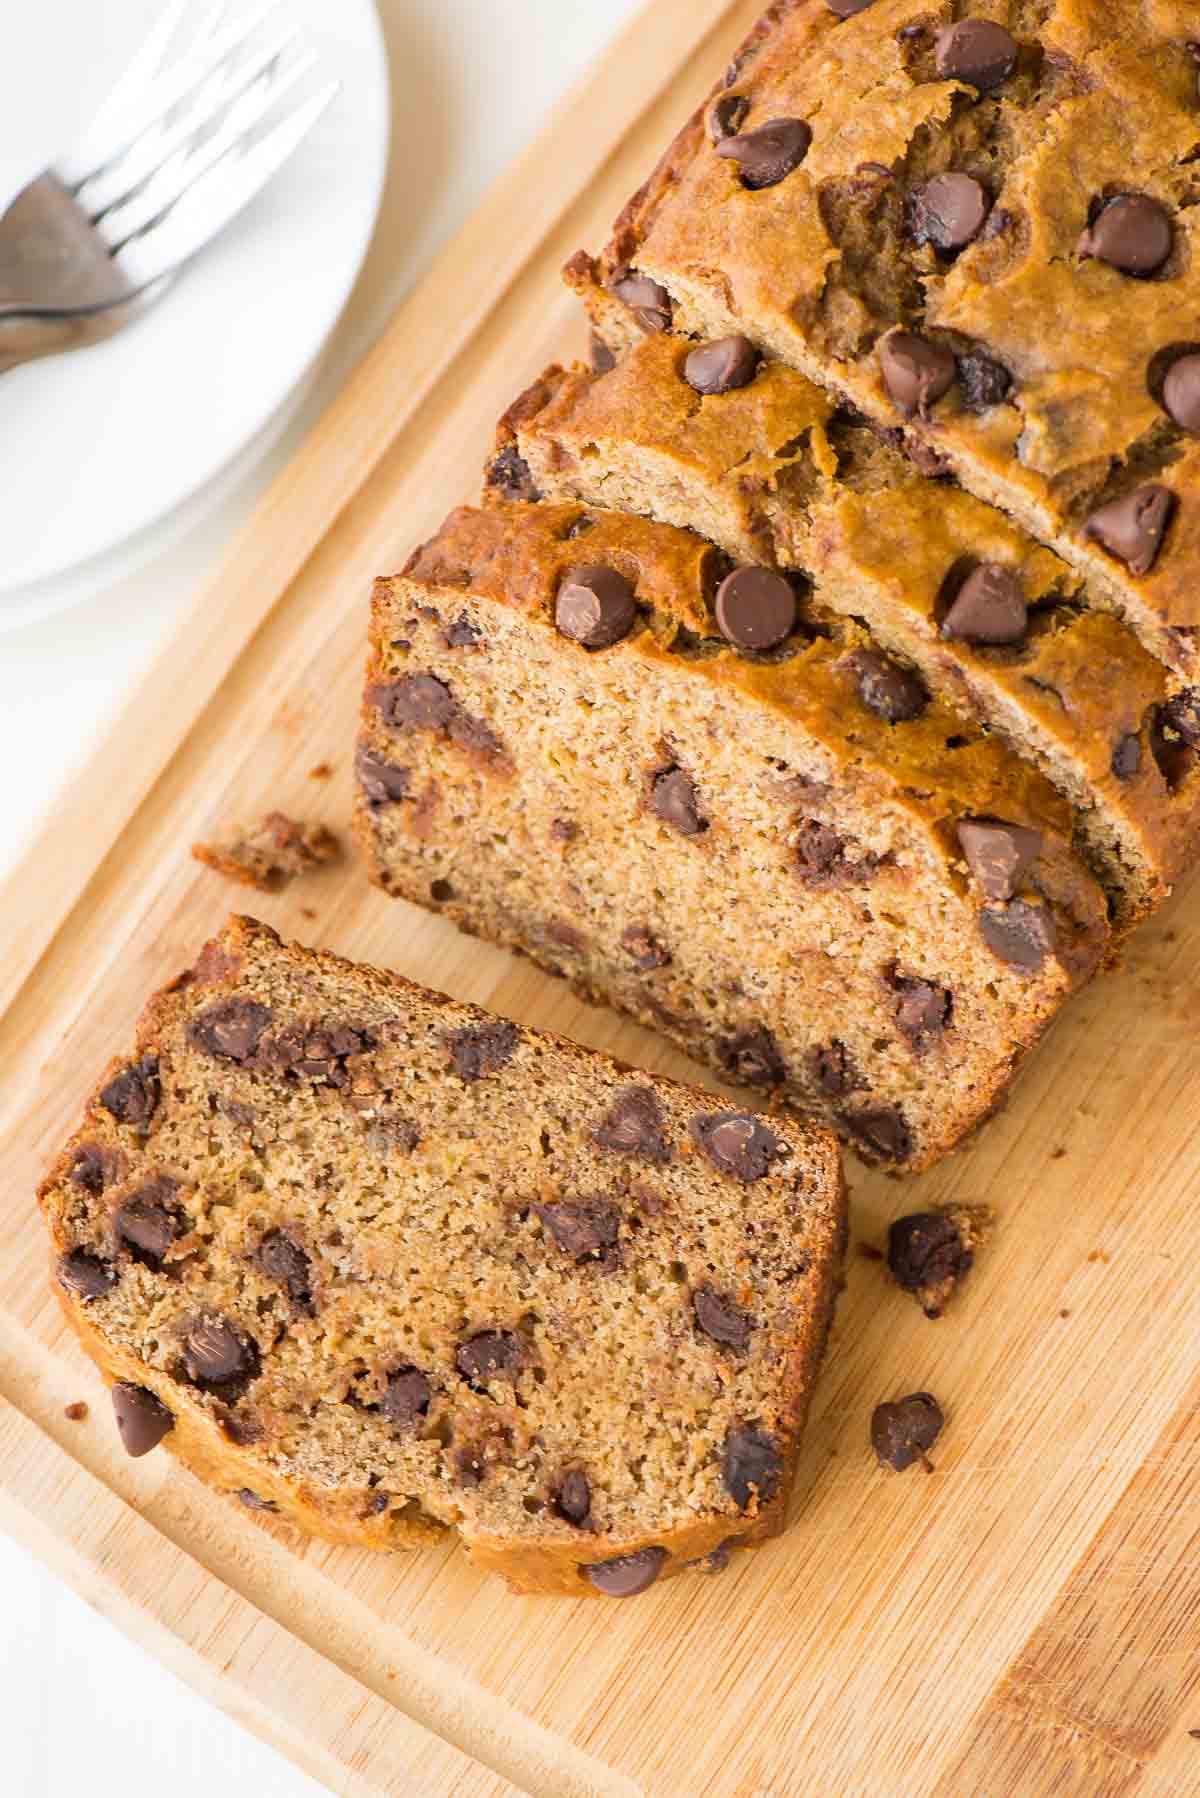 Healthy Bread Recipes  Healthy Banana Bread Recipe with Chocolate Chips